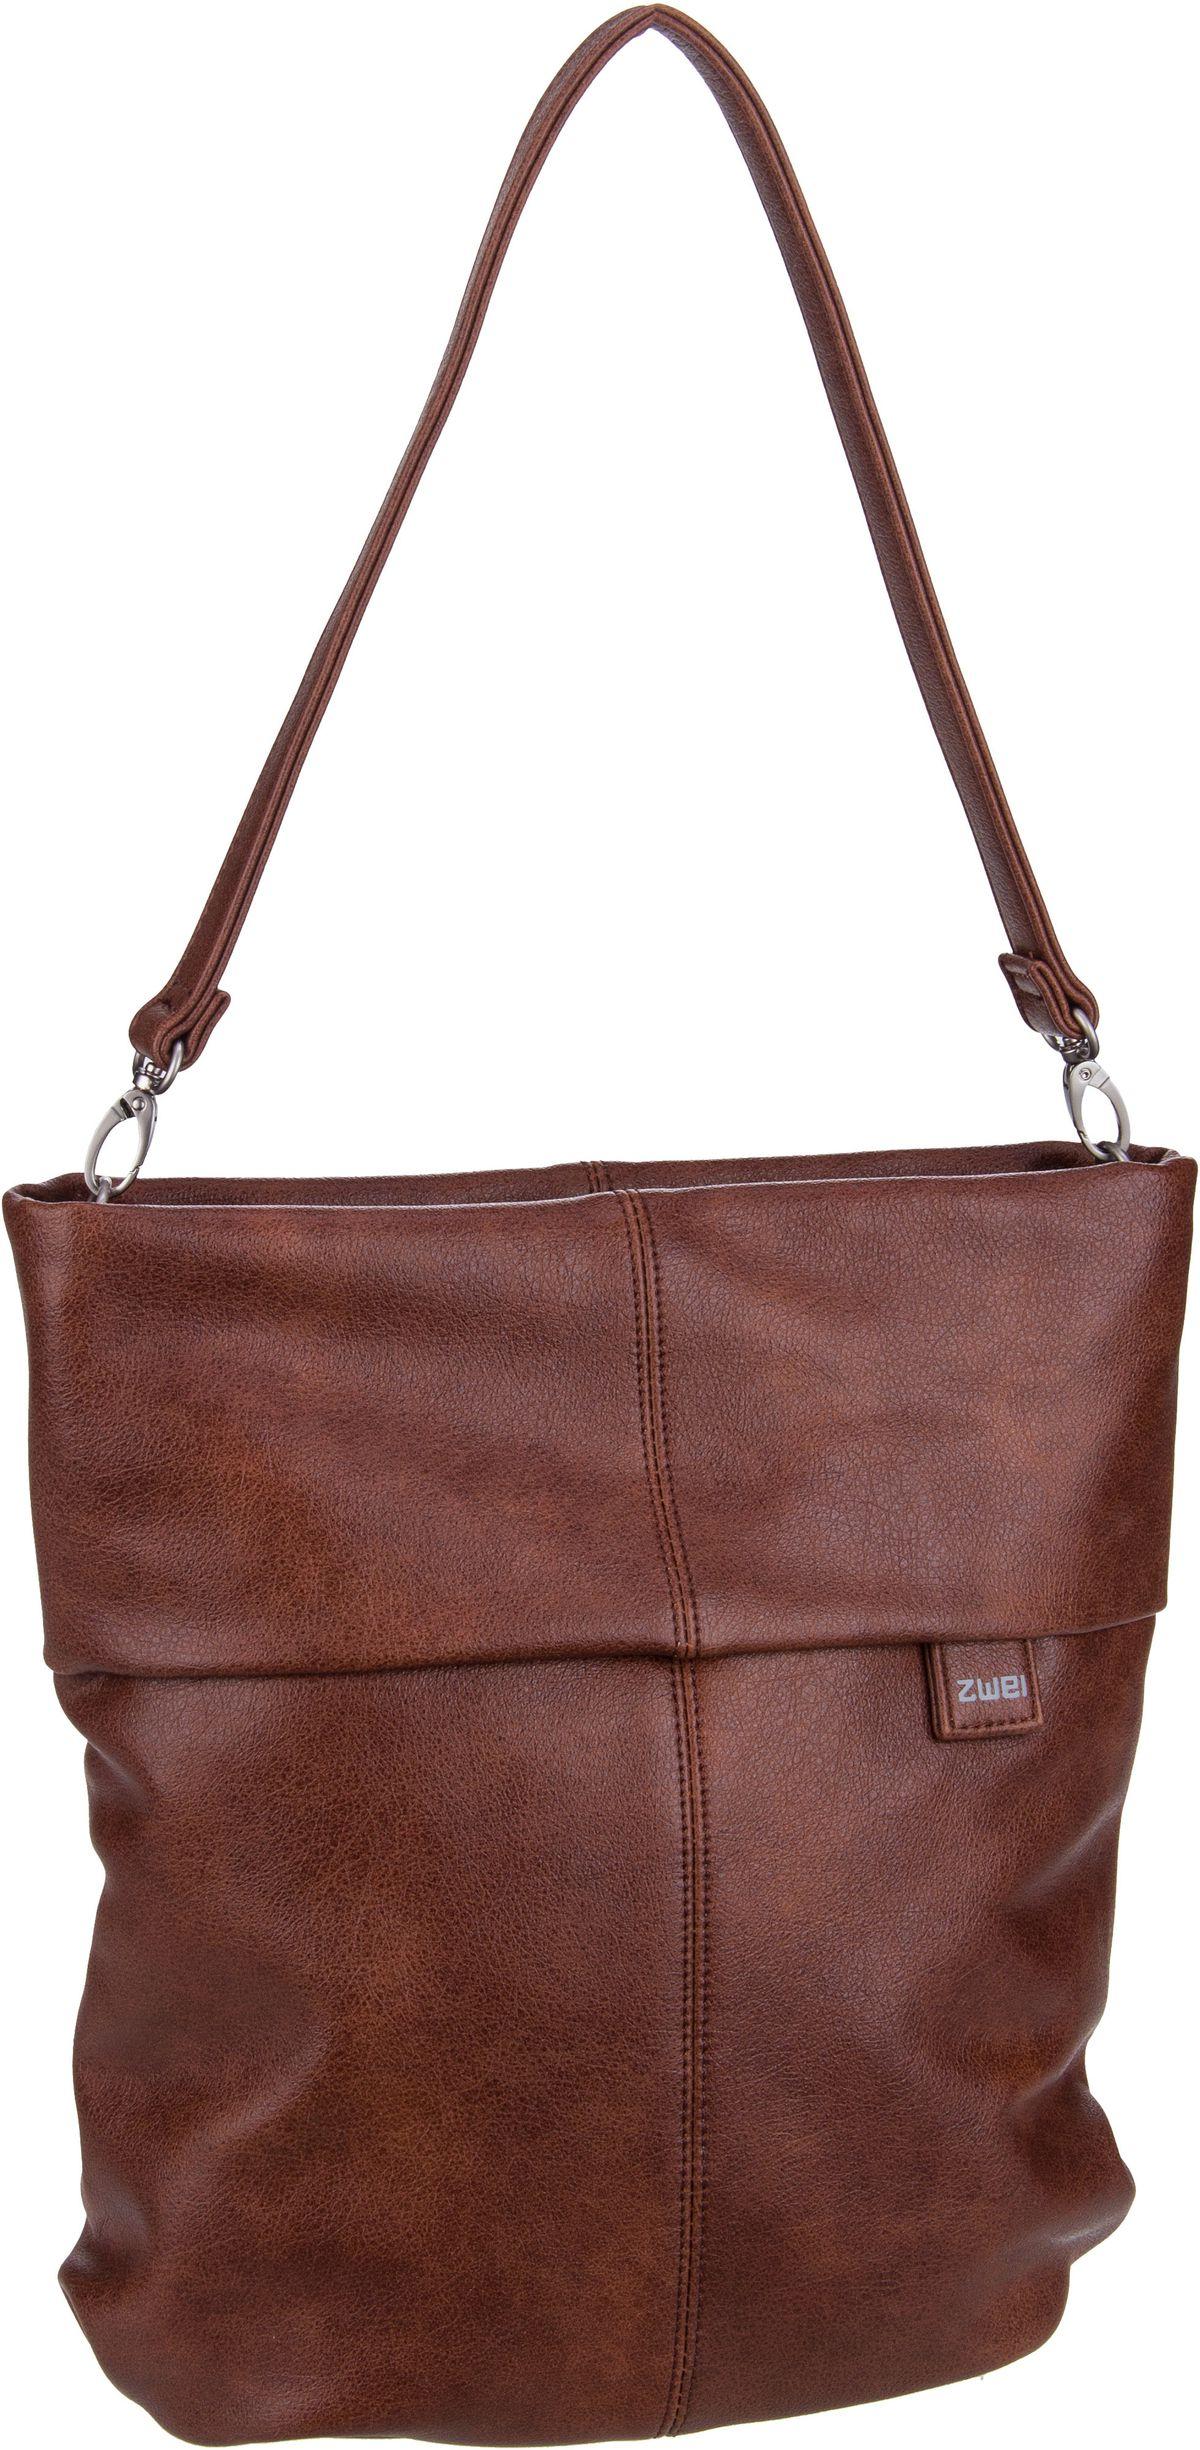 Handtasche Mademoiselle M12 Cognac (7 Liter)